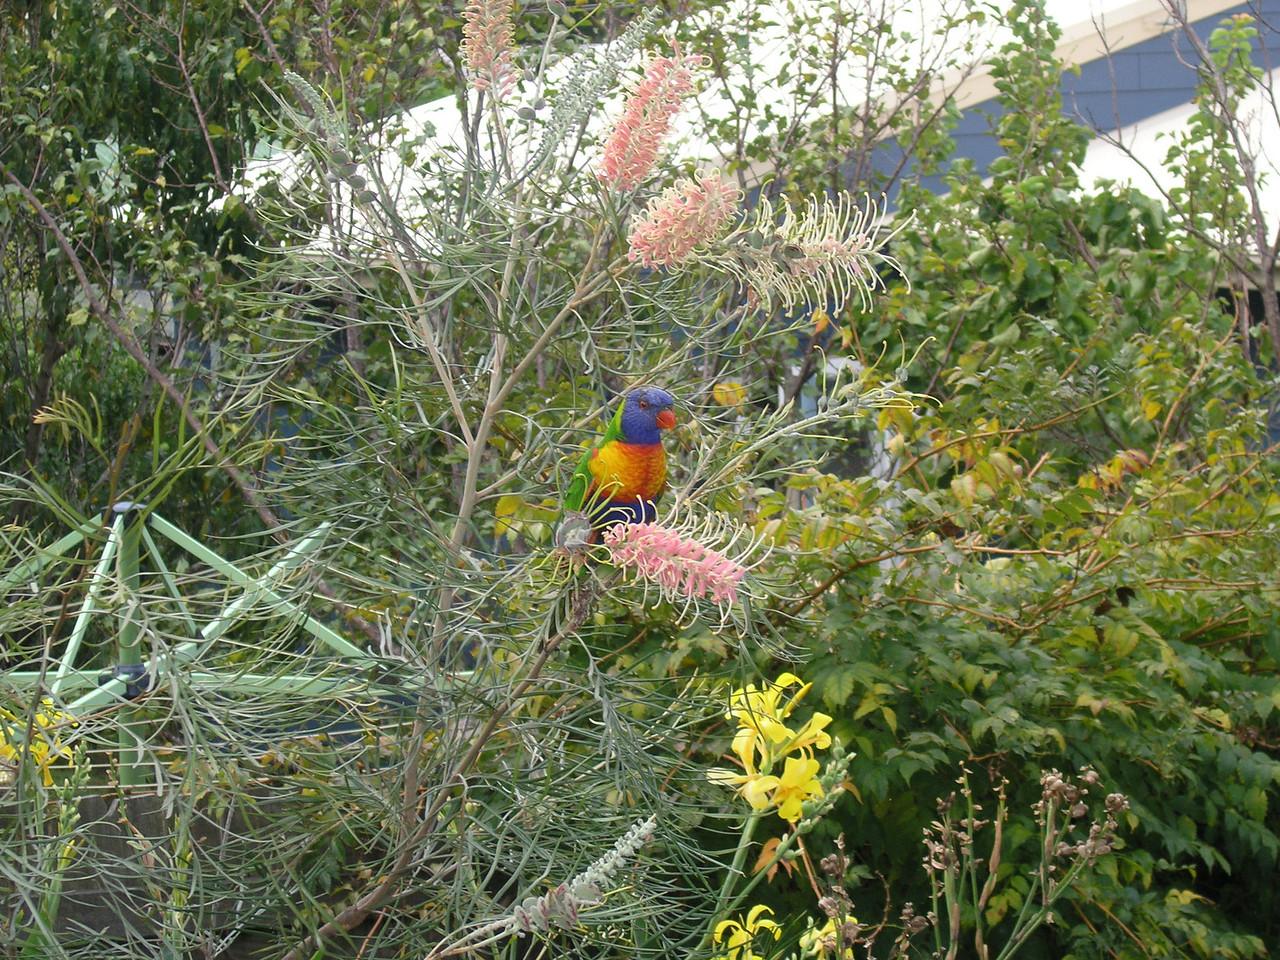 Rainbow lorikeet at Wamberal